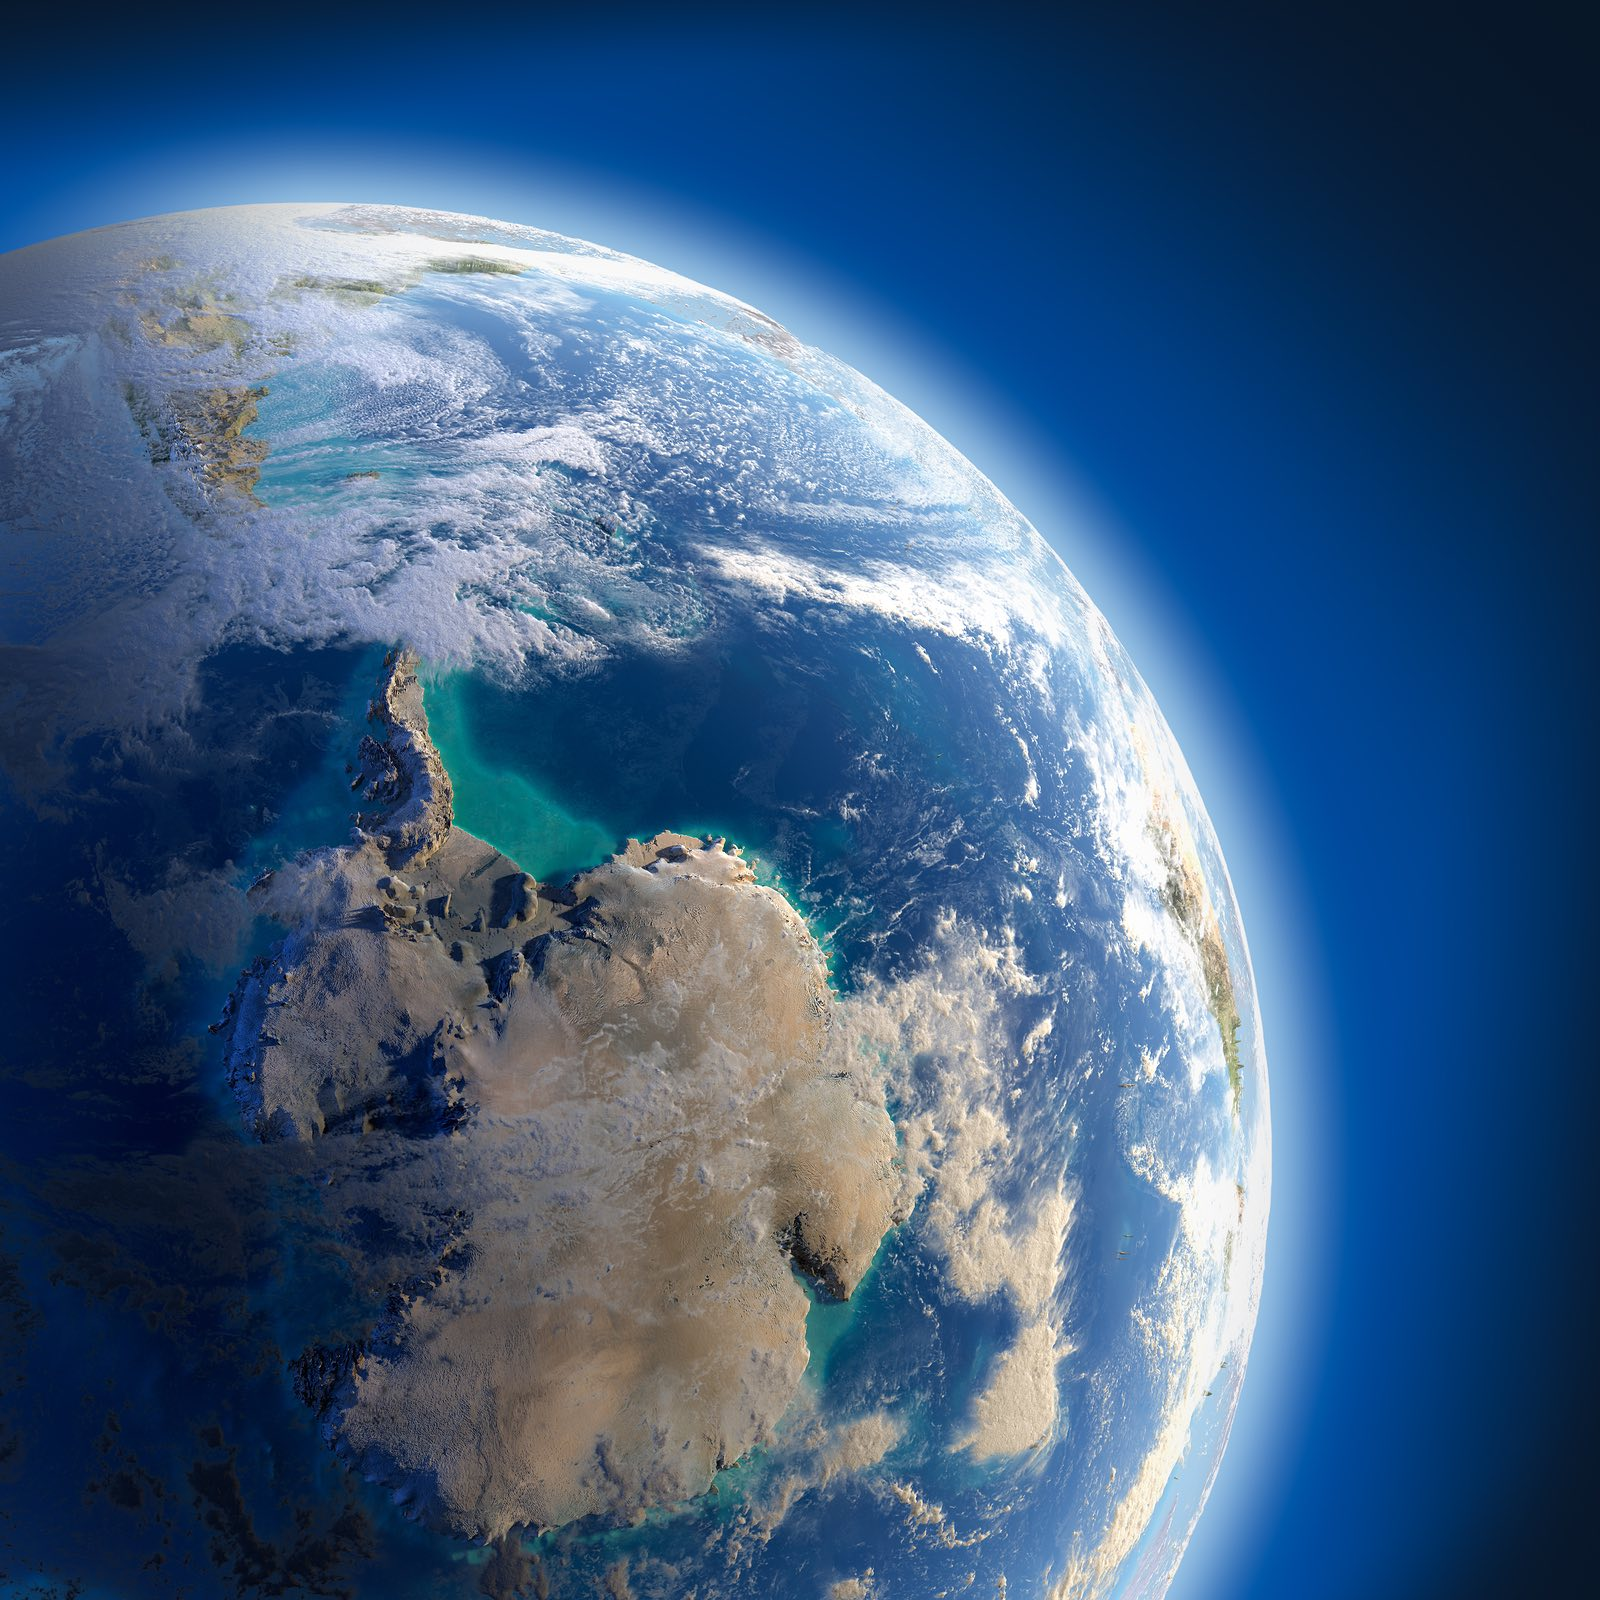 bigstock-Earth-With-High-Relief-Illumi-28645604 copy